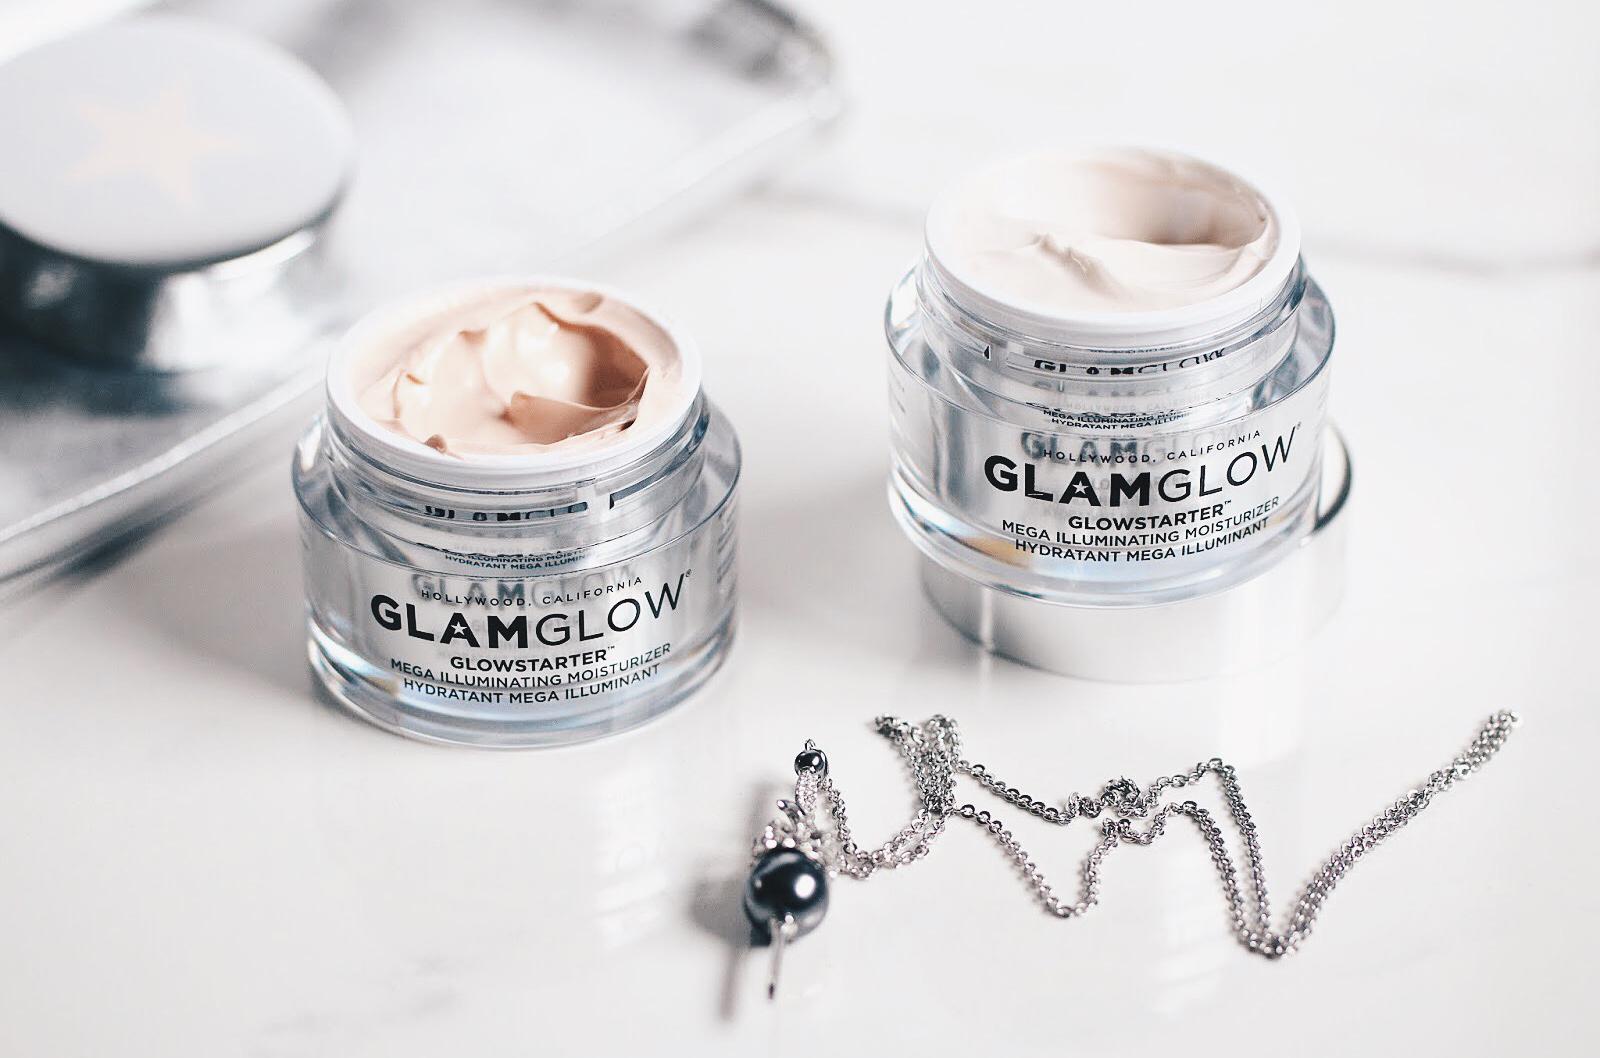 glamglow glow starter nude pearl avis test swatch